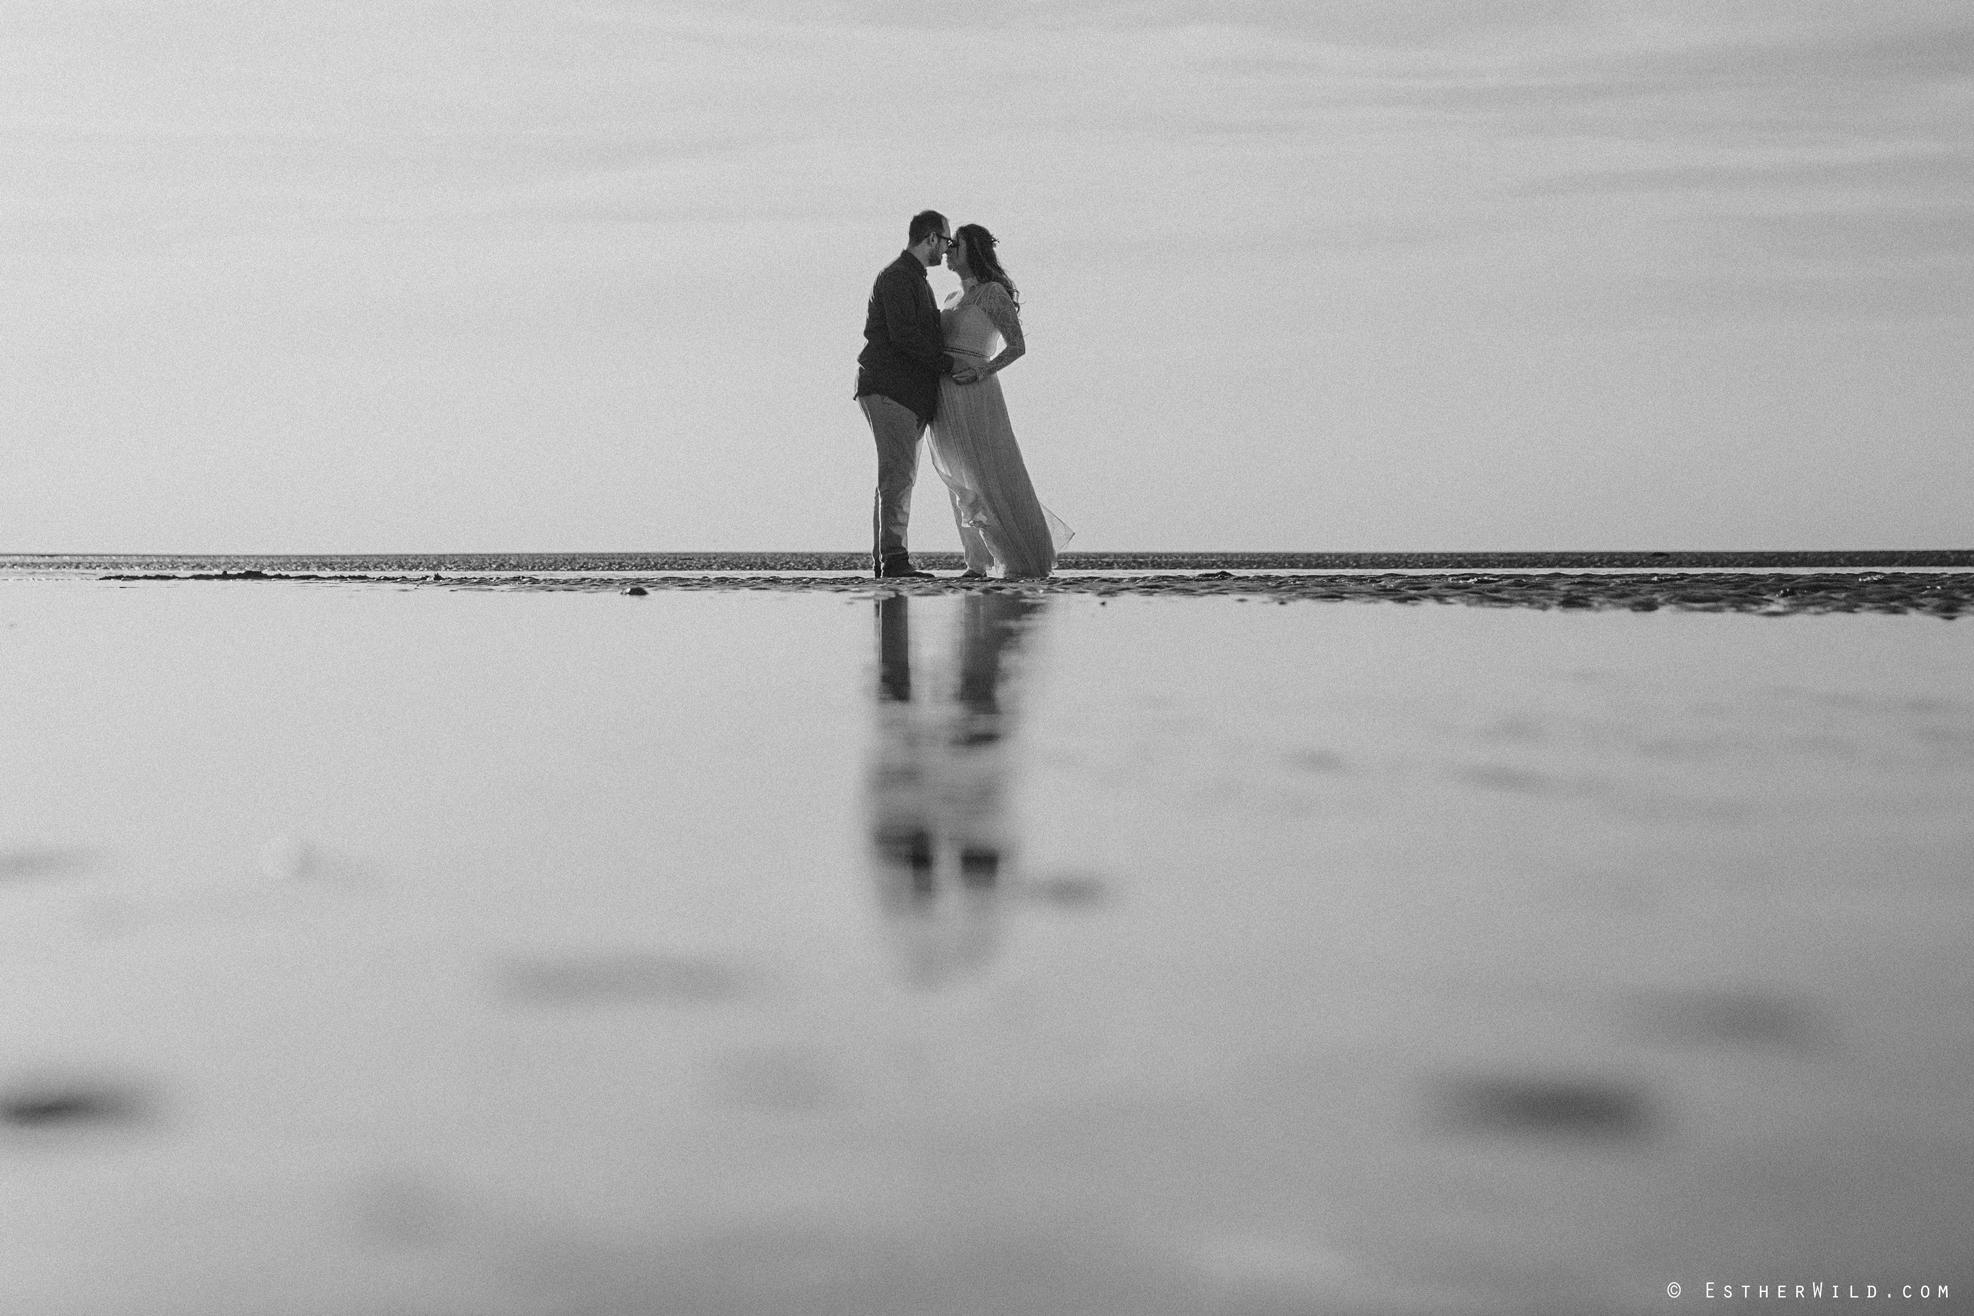 Couple_Anniversary_Wedding_Photography_Hunstanton_Norfolk_Esther_Wild_Share_Copy_IMG_8724-1.jpg